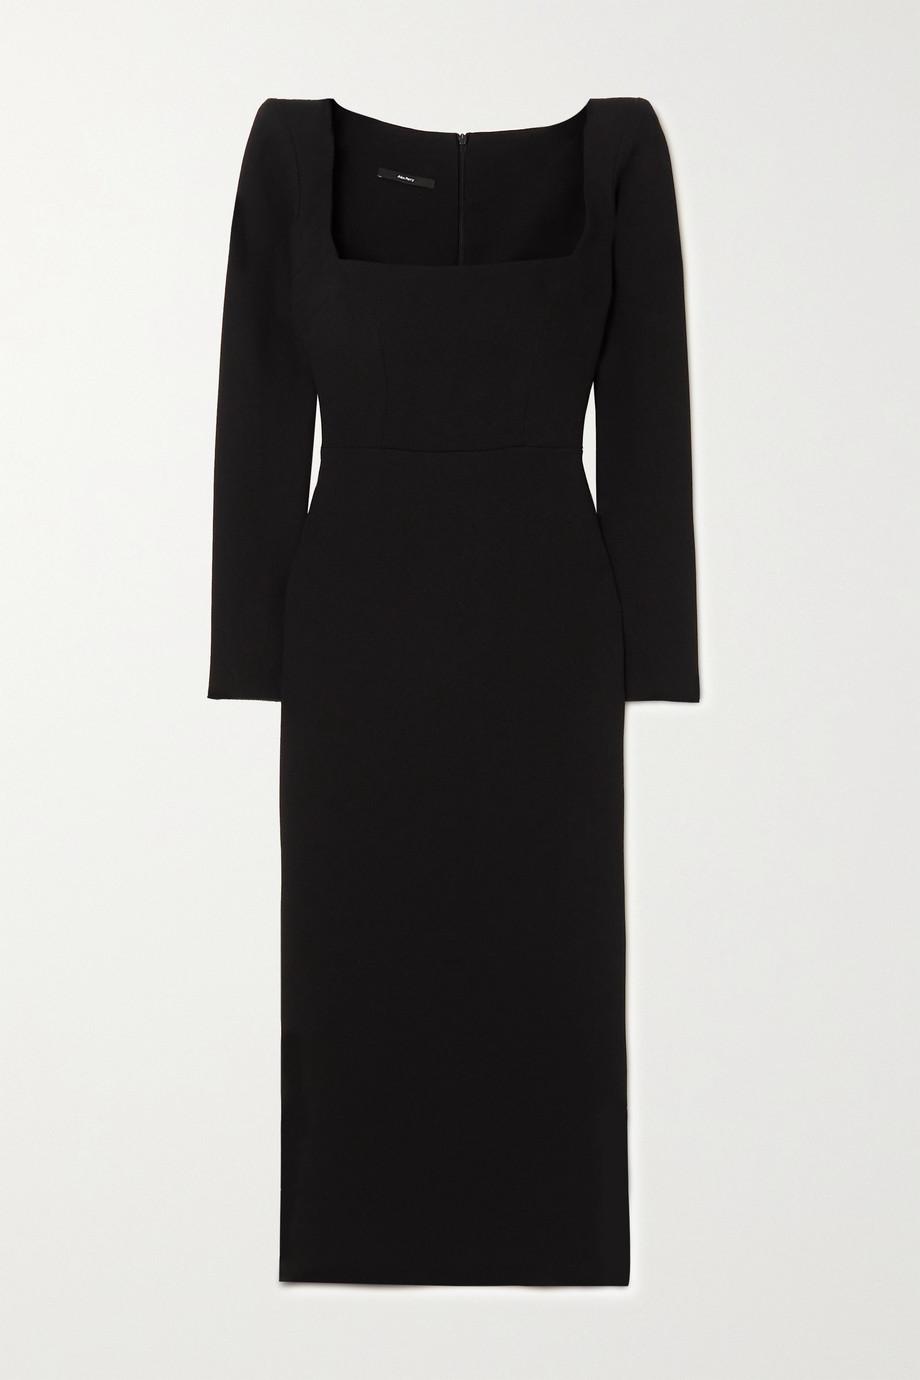 Alex Perry Baird stretch-crepe midi dress